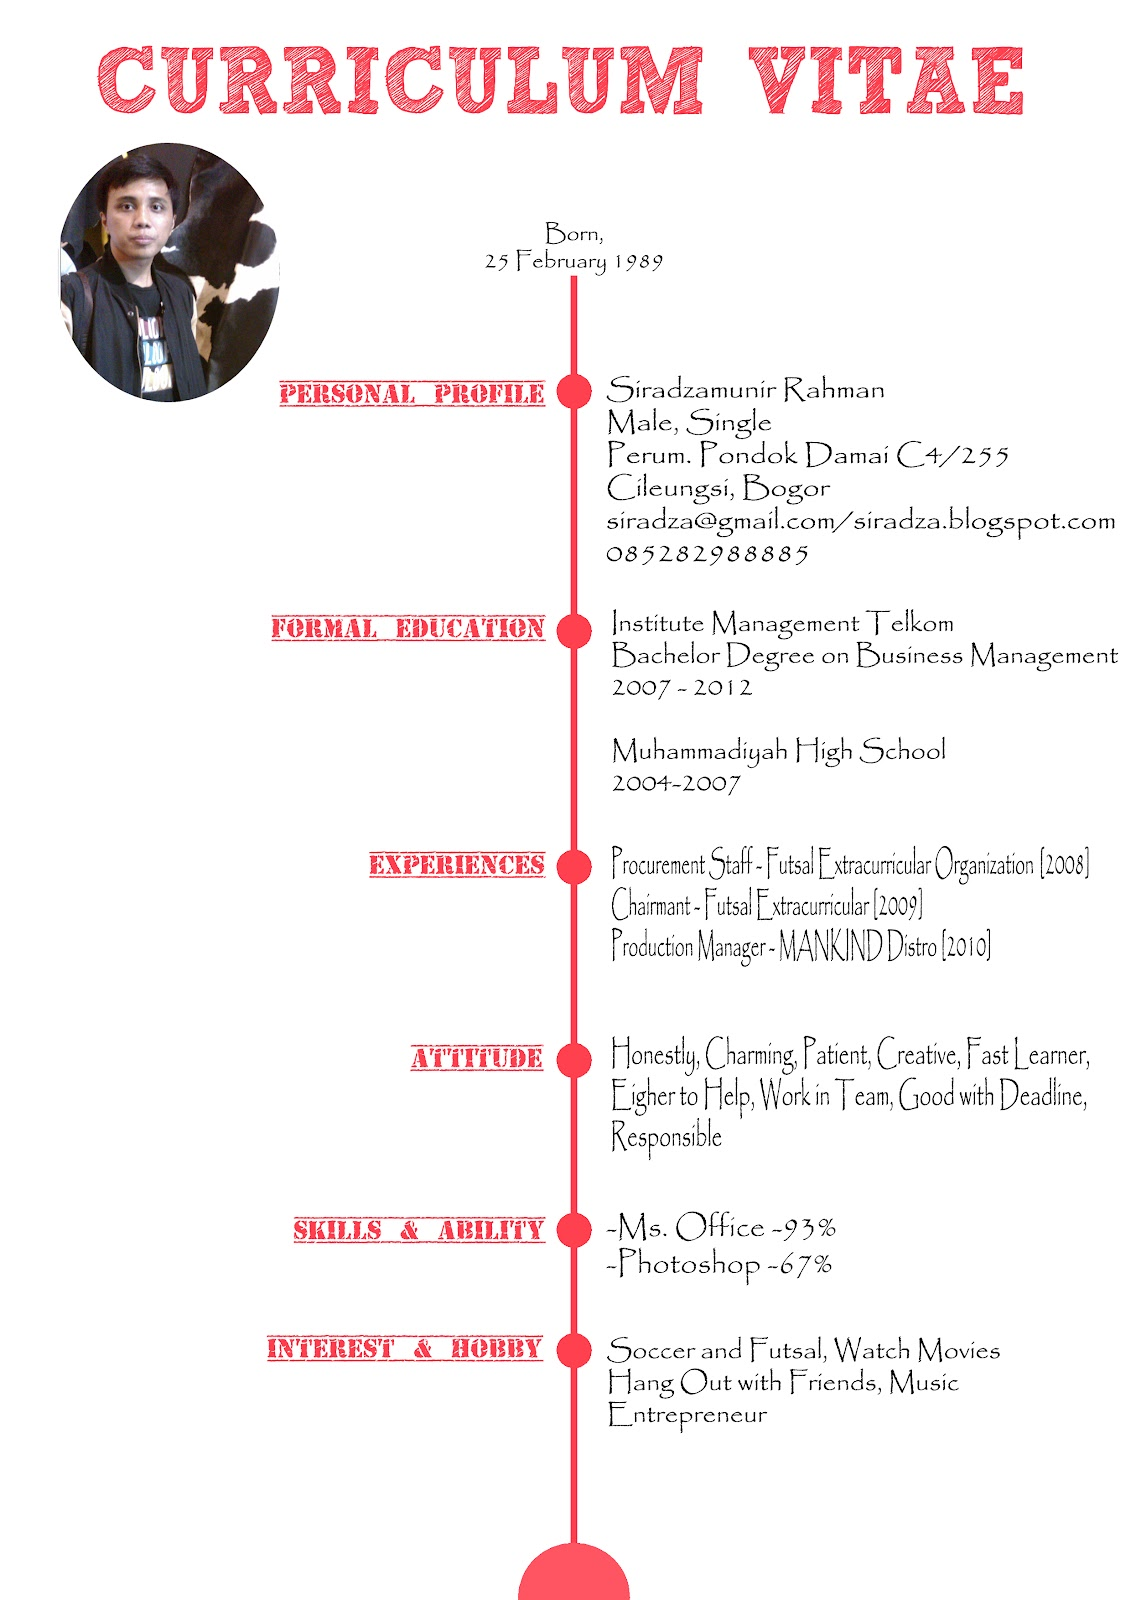 contoh daftar riwayat hidup lamaran kerja, contoh daftar riwayat hidup doc, download contoh cv, contoh lamaran kerja, daftar riwayat hidup sederhana, format daftar riwayat hidup, contoh cv fresh graduate, contoh cv lamaran kerja yang baik dan benar  ben-jobs.blogspot.com